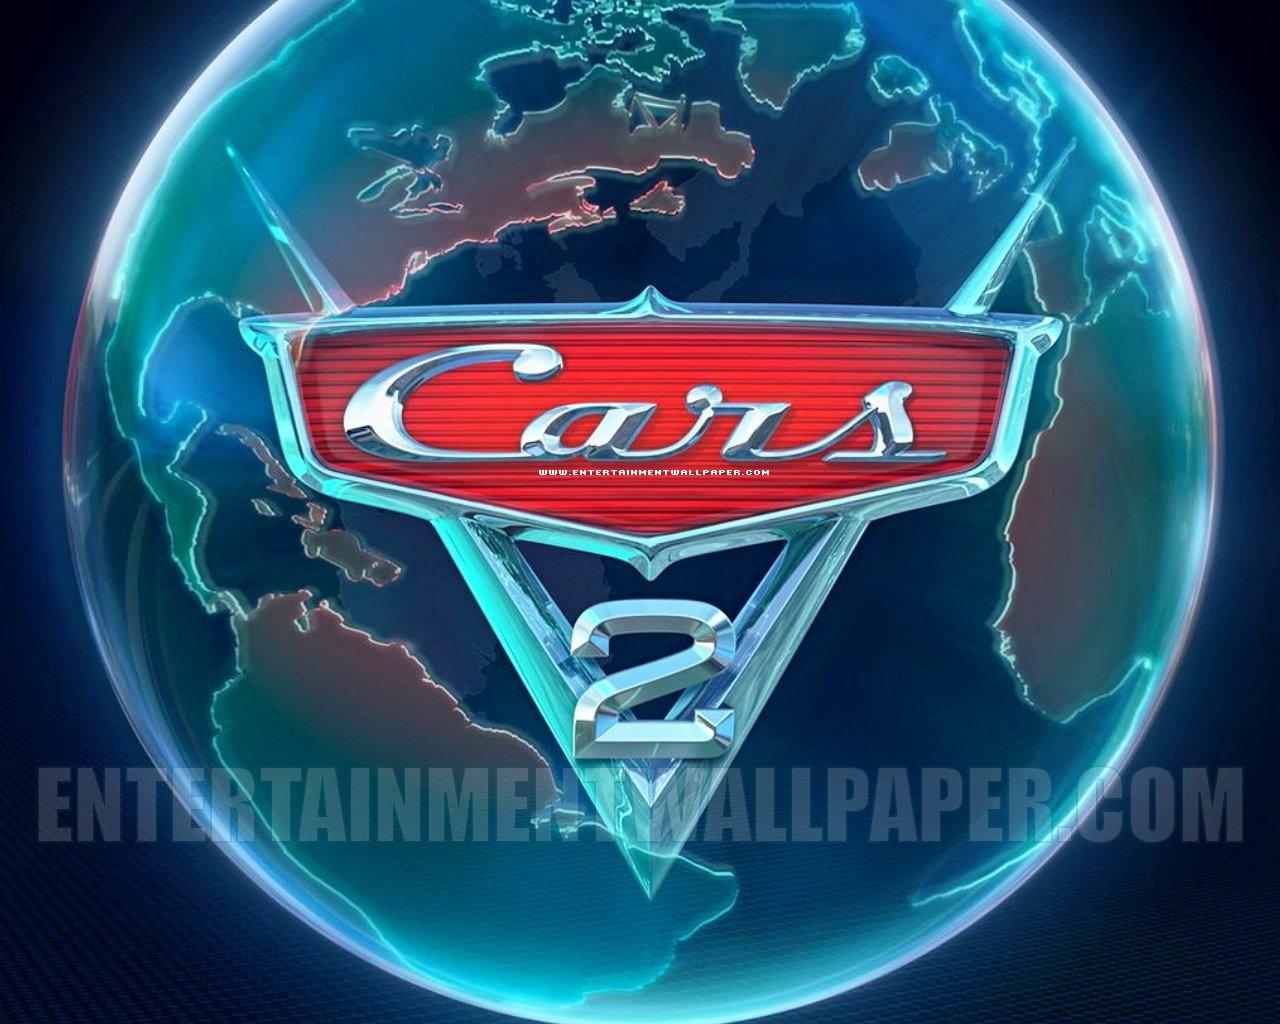 http://3.bp.blogspot.com/-dO_KlSvmETE/TwMT3d9TBdI/AAAAAAAAEls/awDOC184hAQ/s1600/Cars%2B2%2BPictures%2B001.jpg